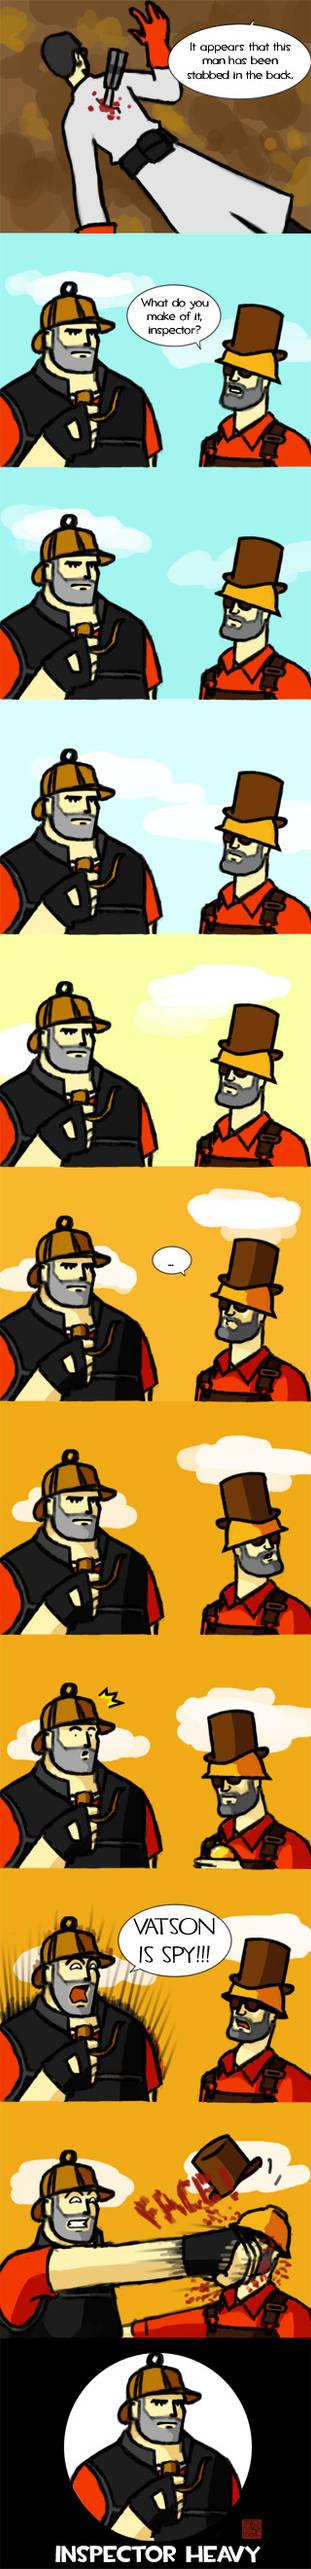 Inspector Heavy